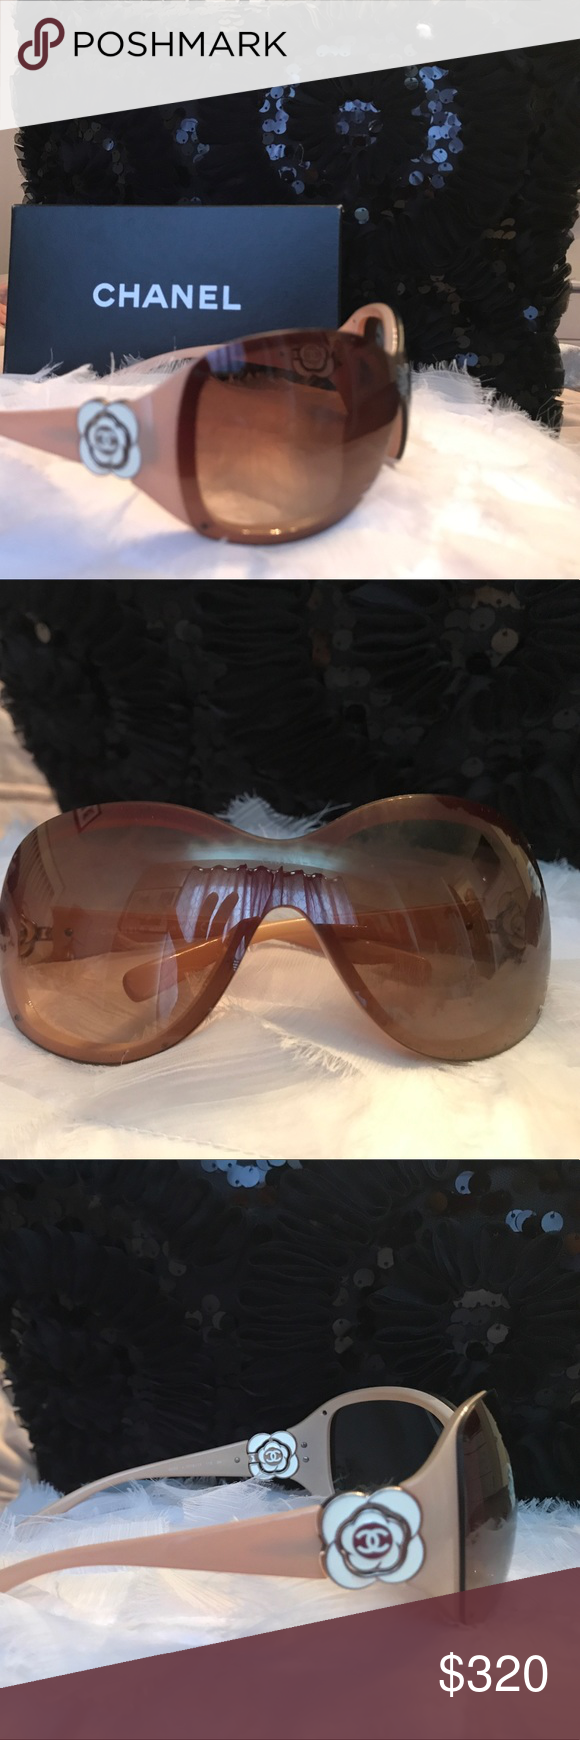 2ec7a9ef6d Authentic CHANEL🌸Camellia Flower Sunglasses Beautiful Chanel oversized  shield lenses